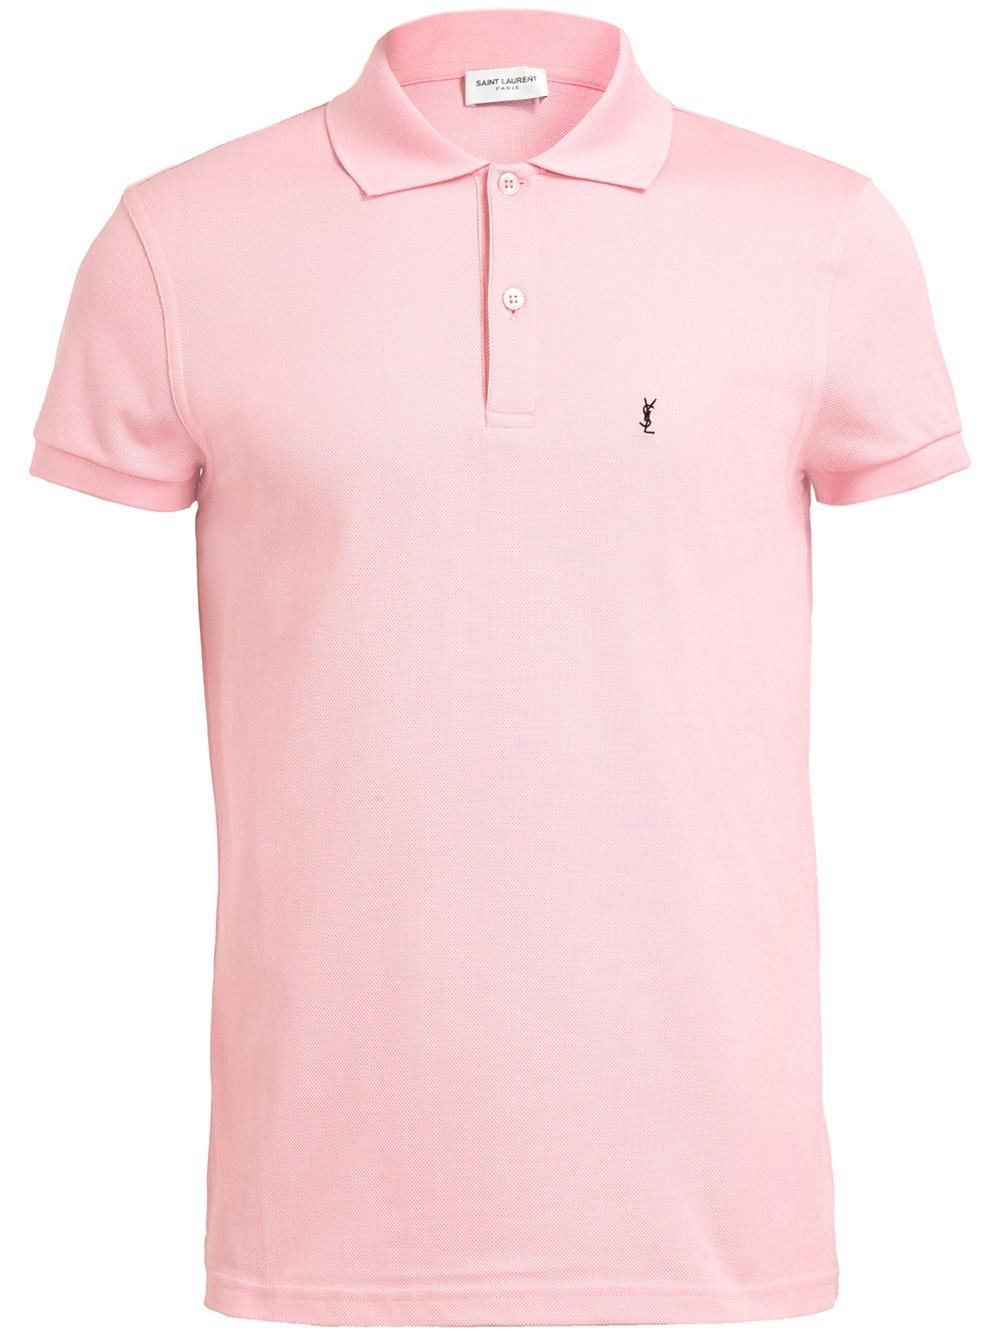 Polo T Shirt Pink South Park T Shirts